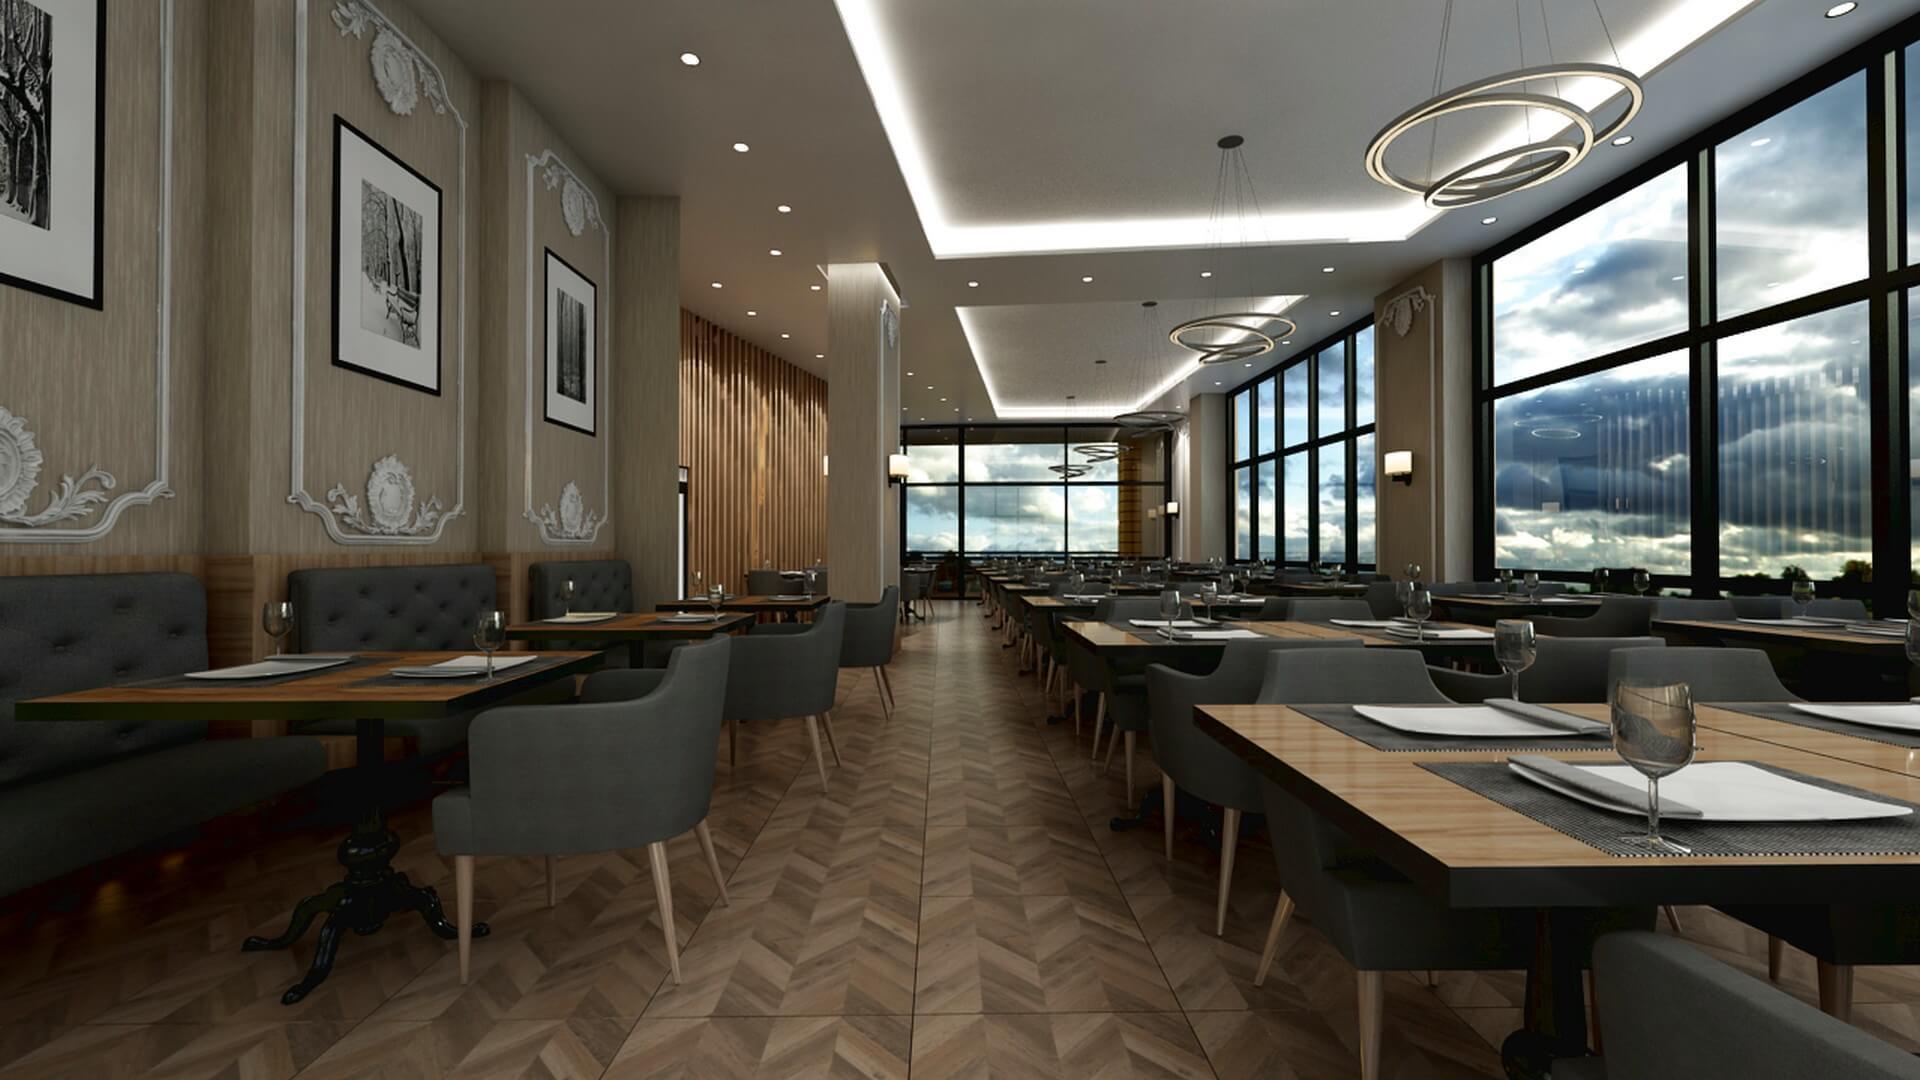 Restoran, Cafe, Fast-food Mimari Projeler Otonomi Restoran